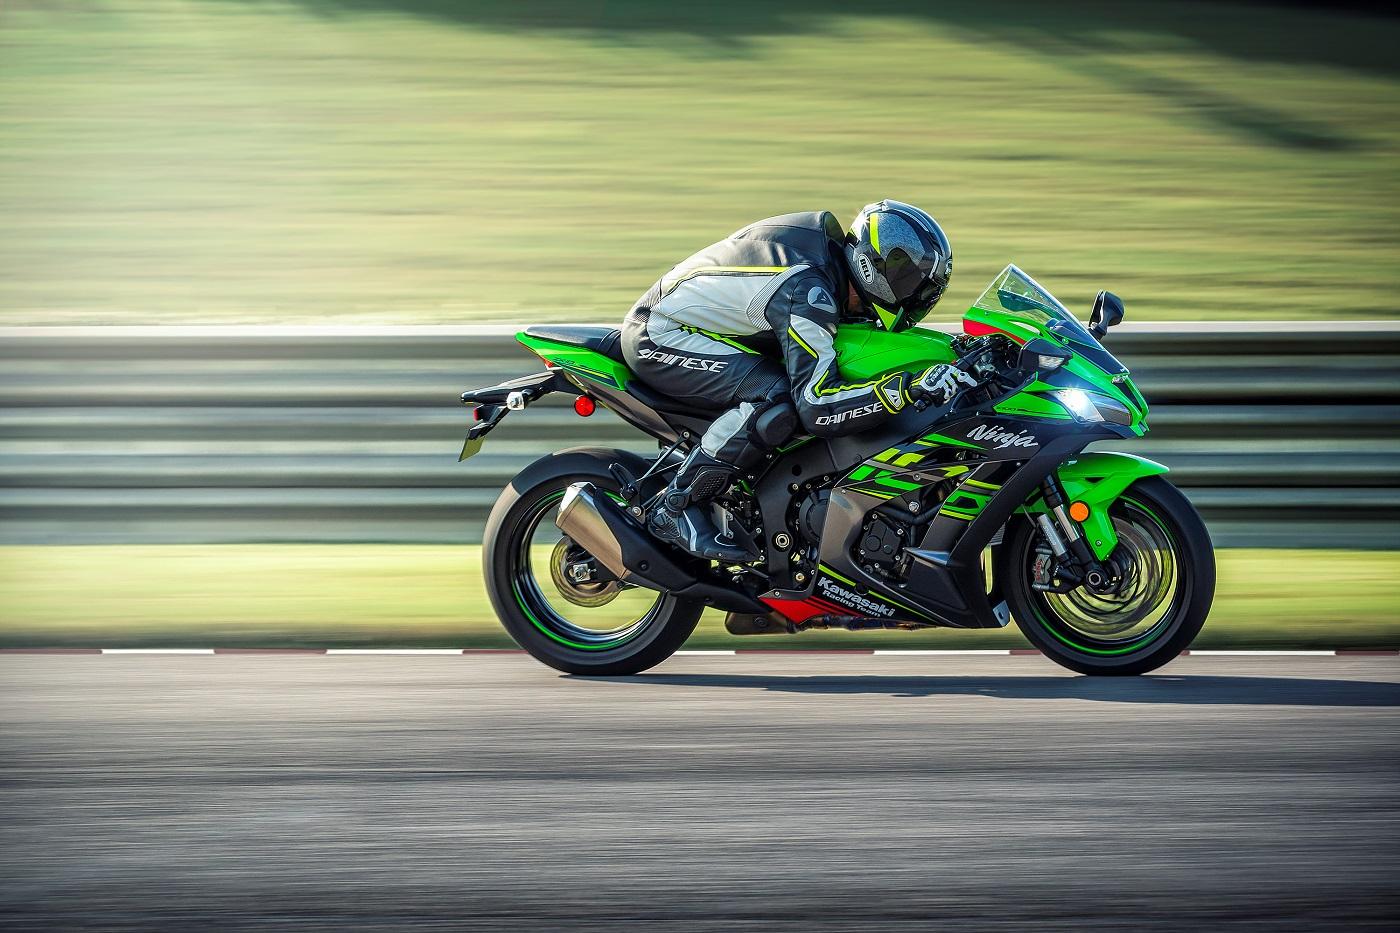 Kawasaki Ninja Zx 10r St Movimento 01